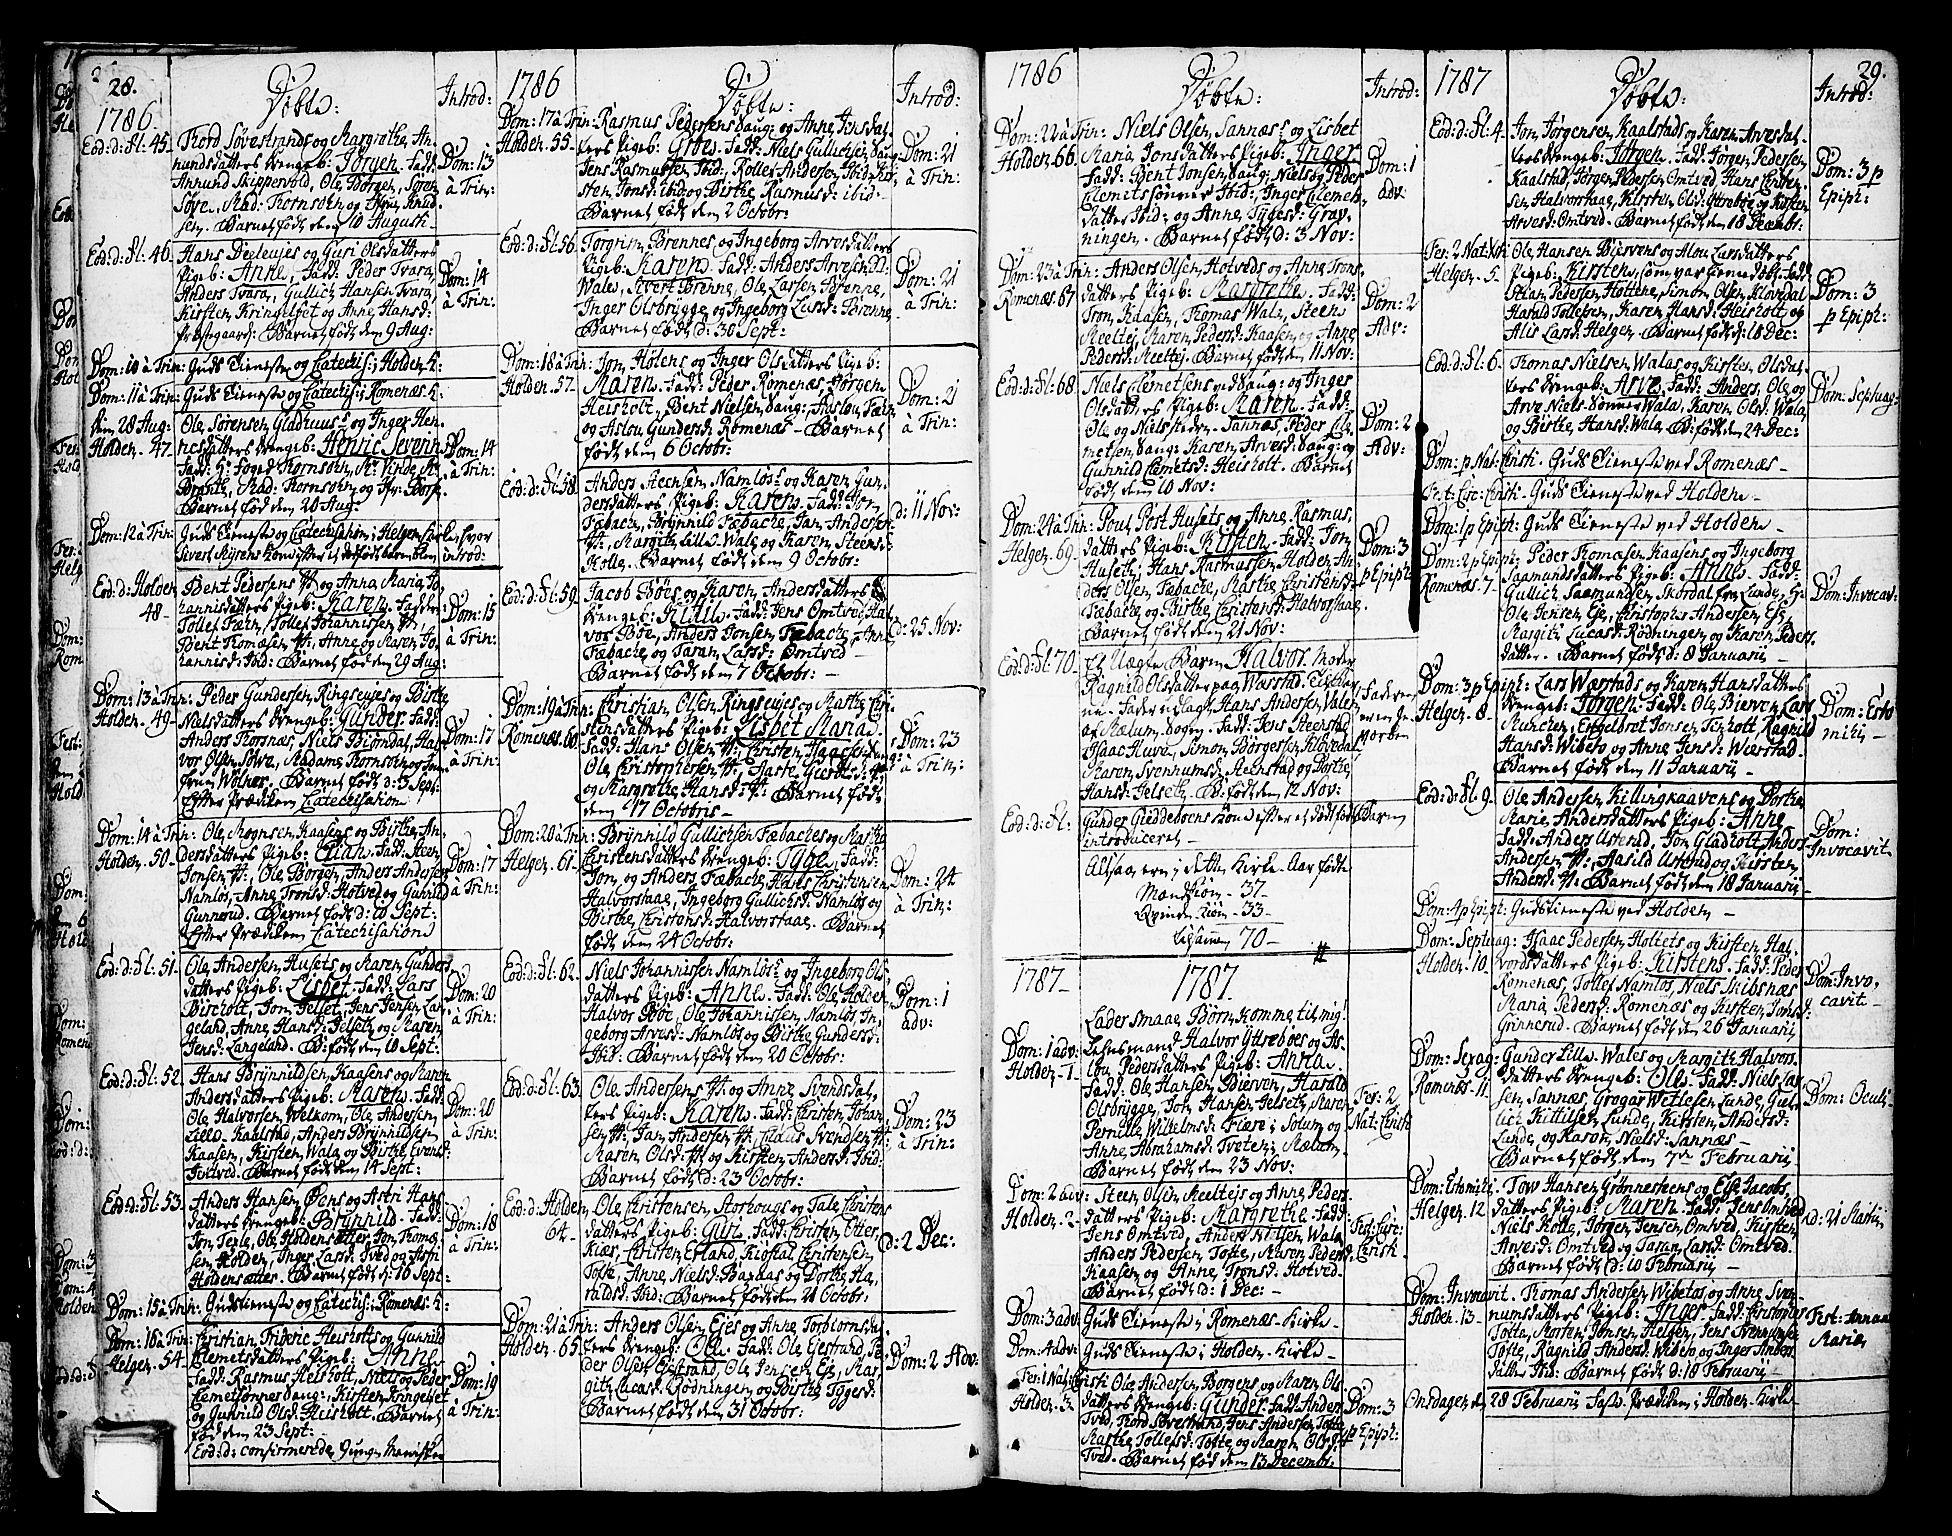 SAKO, Holla kirkebøker, F/Fa/L0002: Ministerialbok nr. 2, 1779-1814, s. 28-29